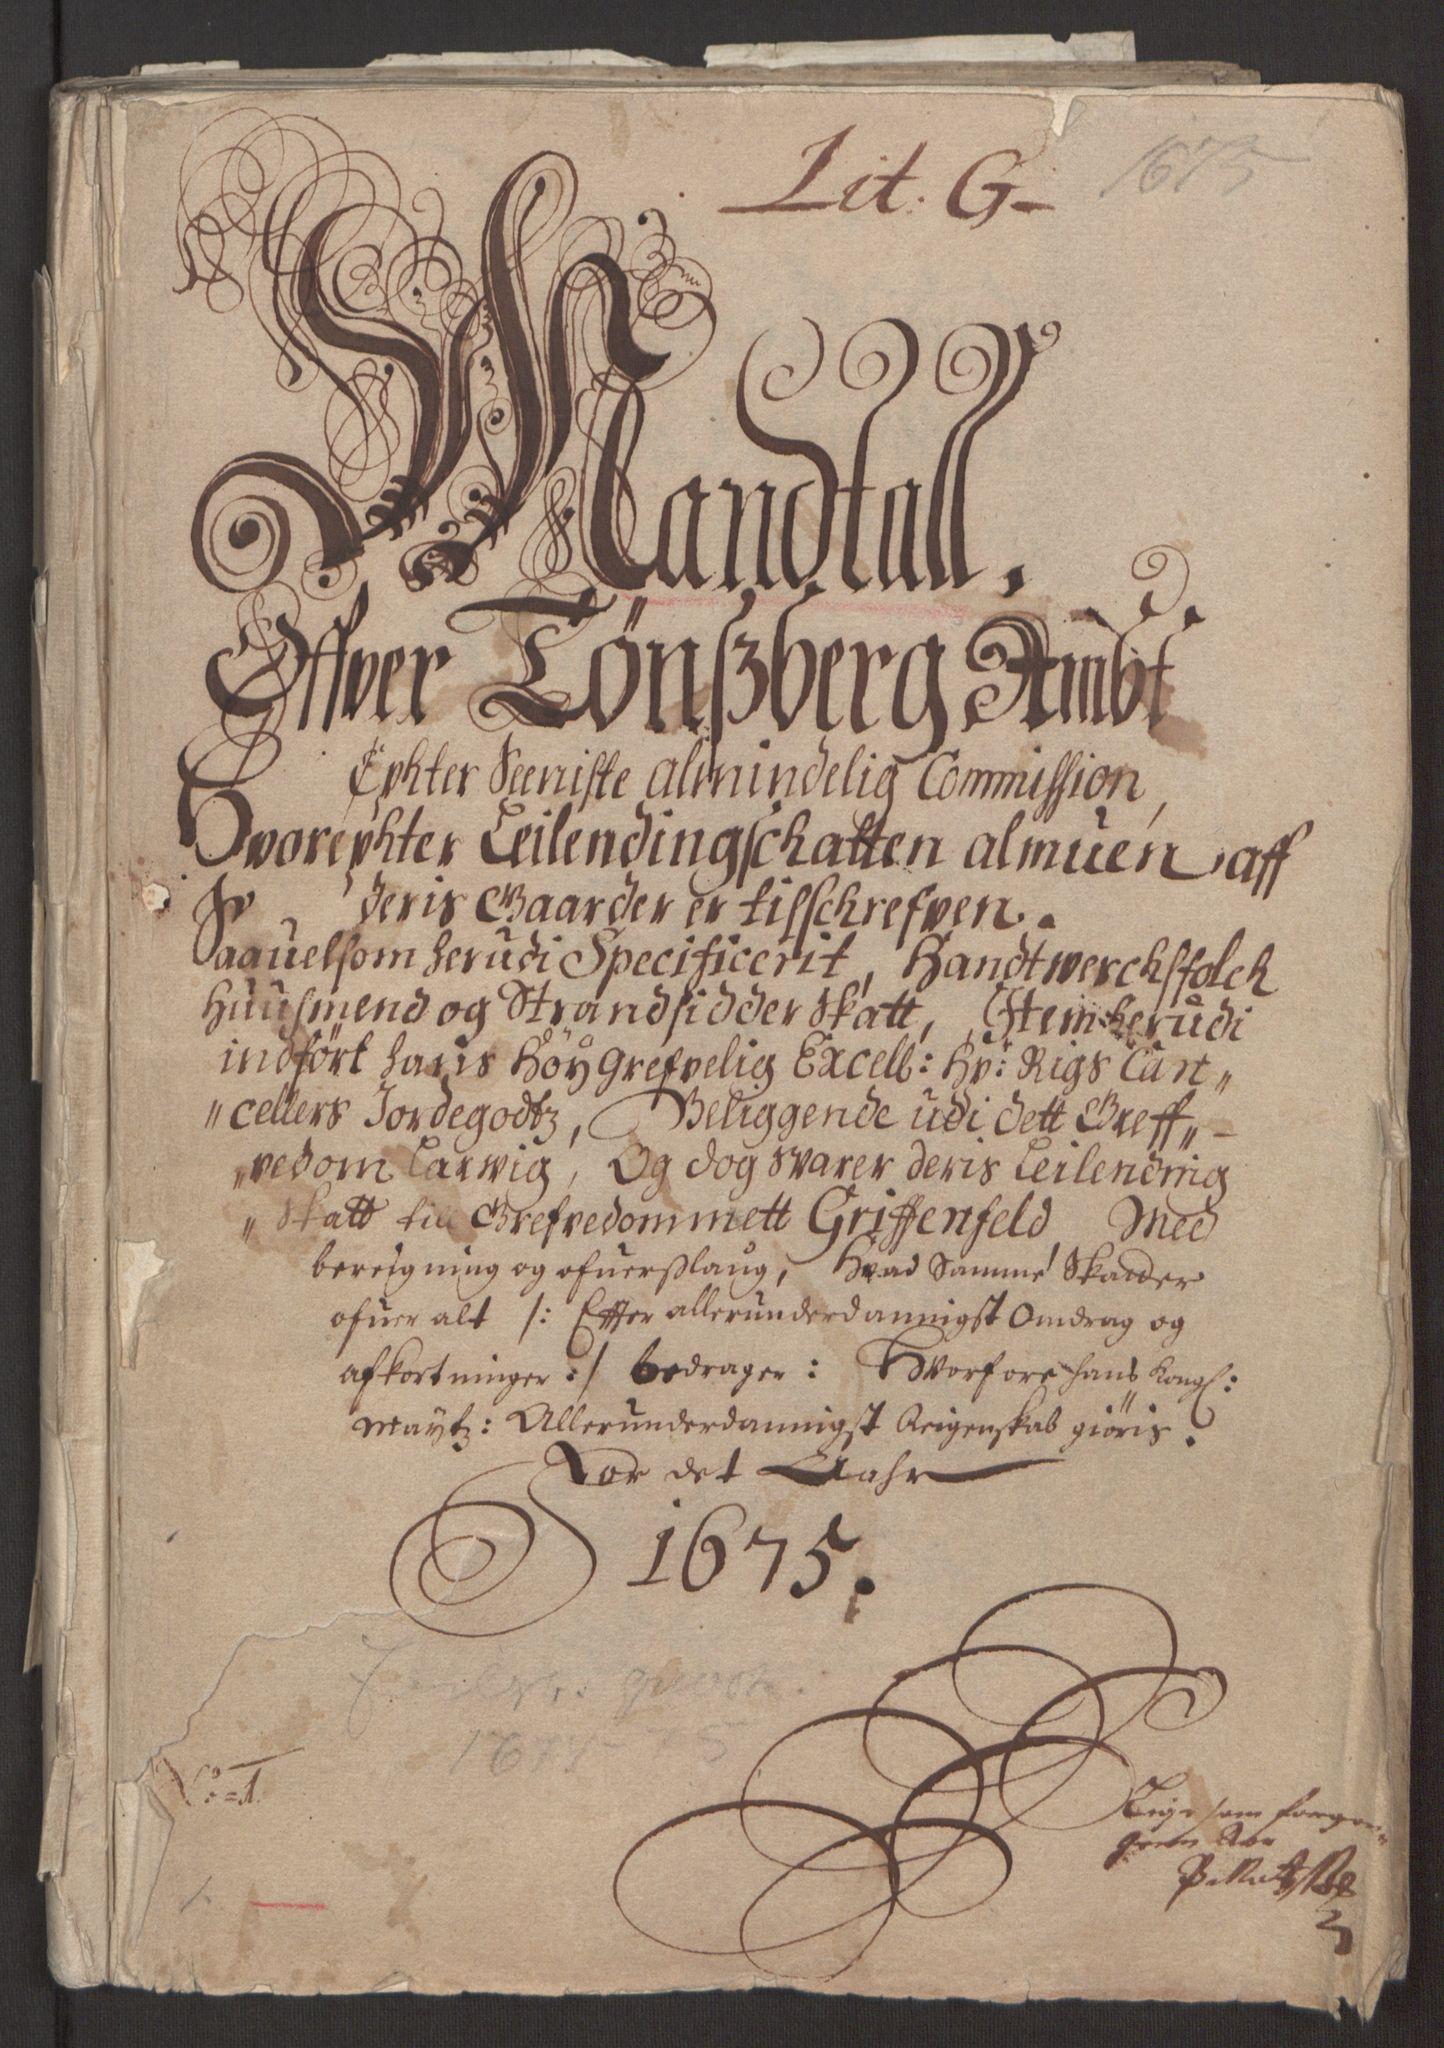 RA, Rentekammeret inntil 1814, Reviderte regnskaper, Fogderegnskap, R32/L1843: Fogderegnskap Jarlsberg grevskap, 1674-1675, s. 111